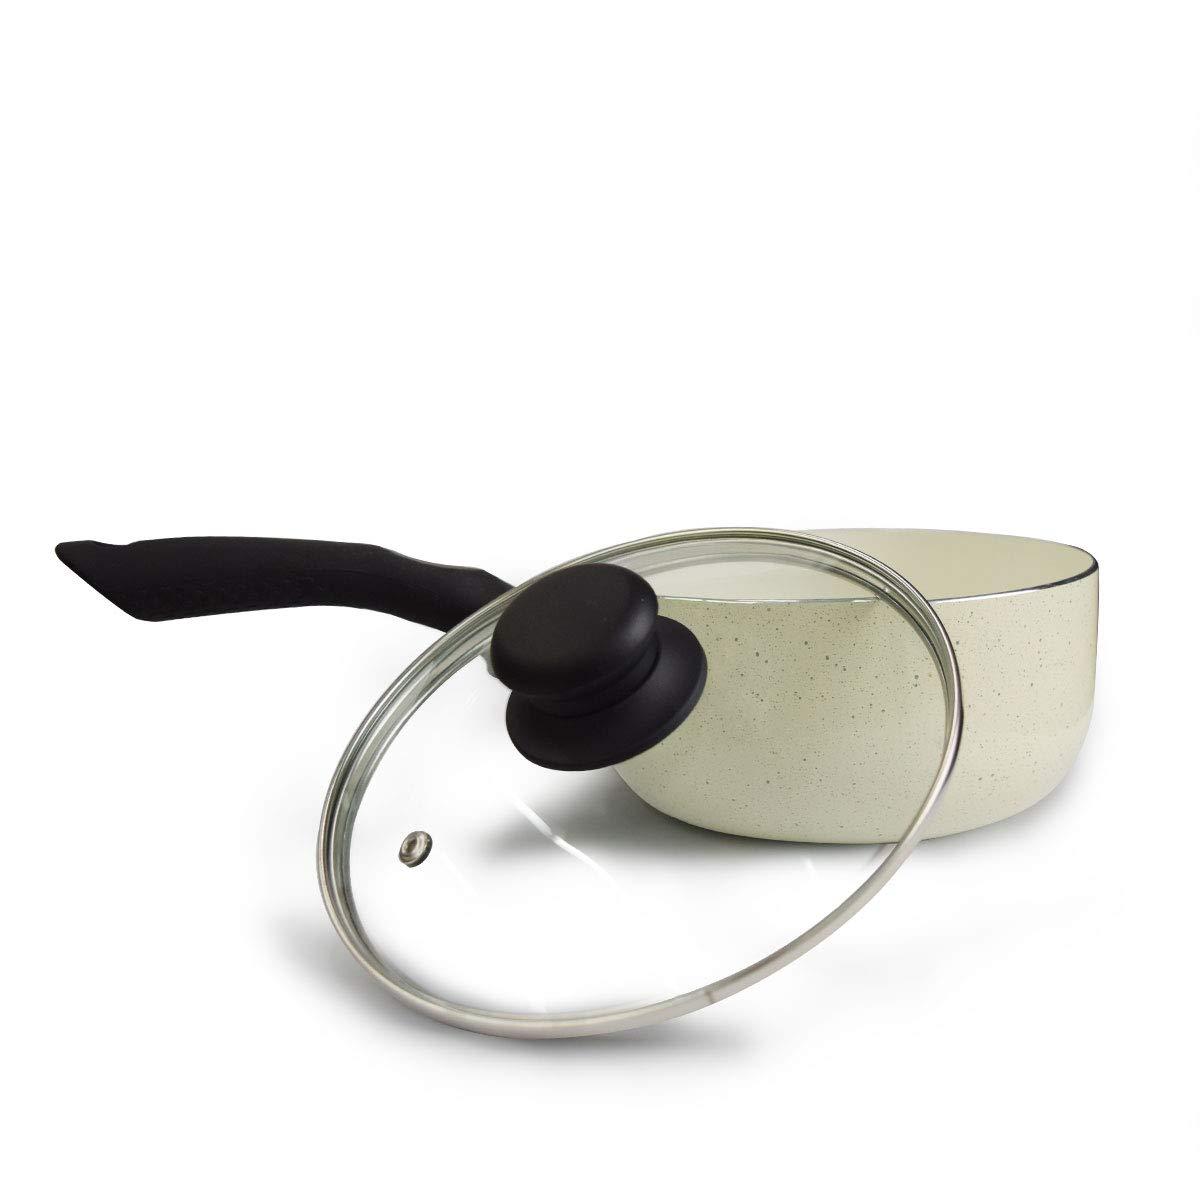 KI 7 Ceramic Non-Stick Saucepan with Glass Lid | PFOA Free Multipurpose Sauce Pot with Ergonomic Handle | 1 Year Warranty